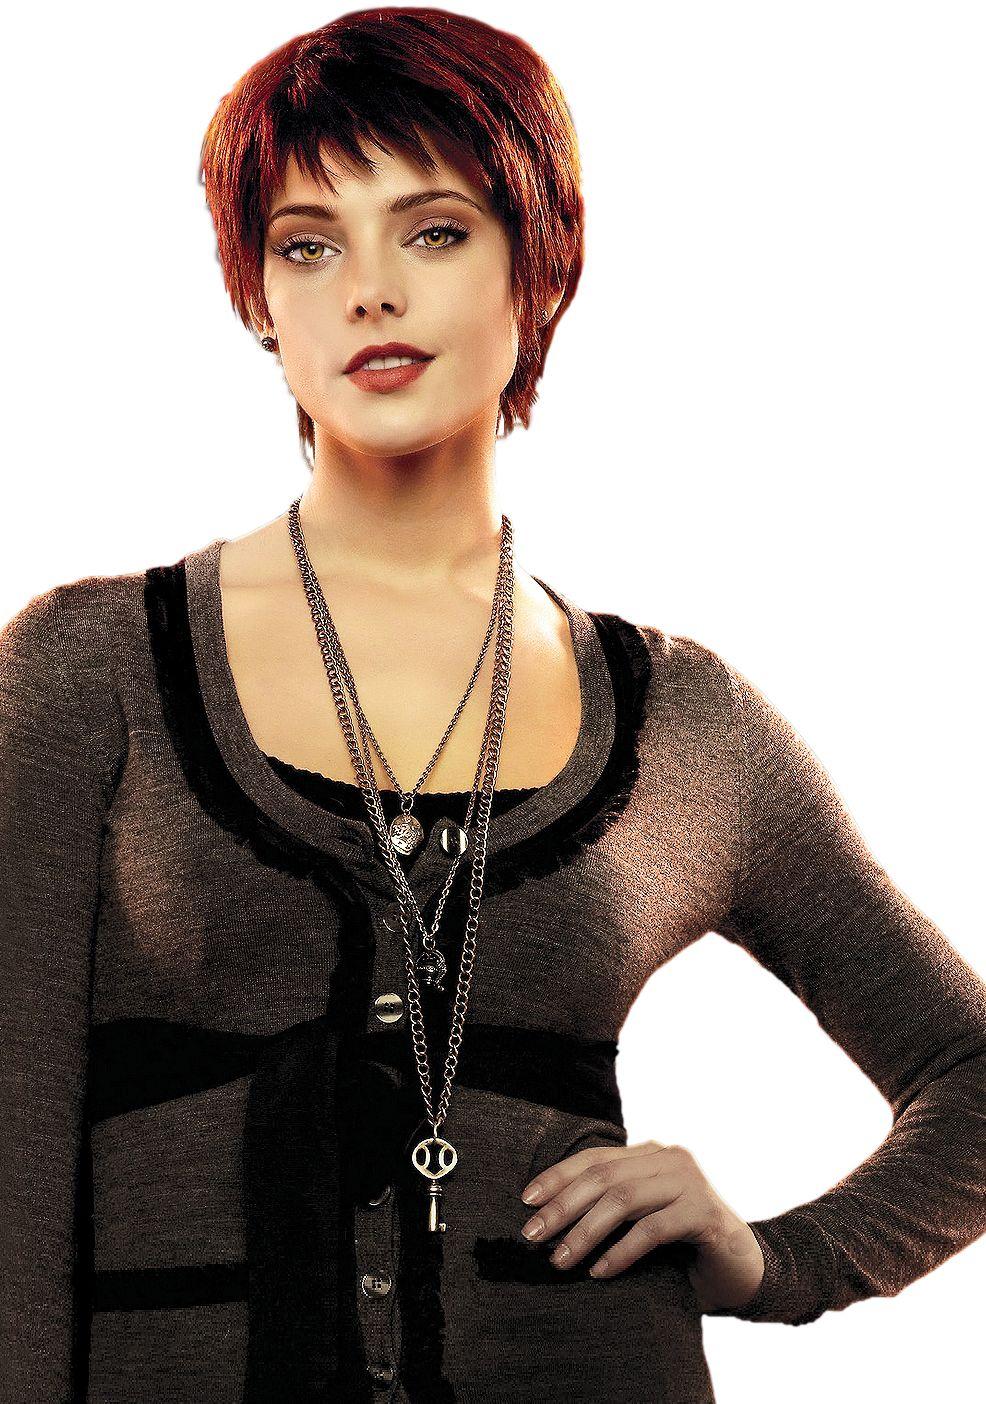 Gallery Alice Cullen Alice Cullen Short Hair Styles Twilight